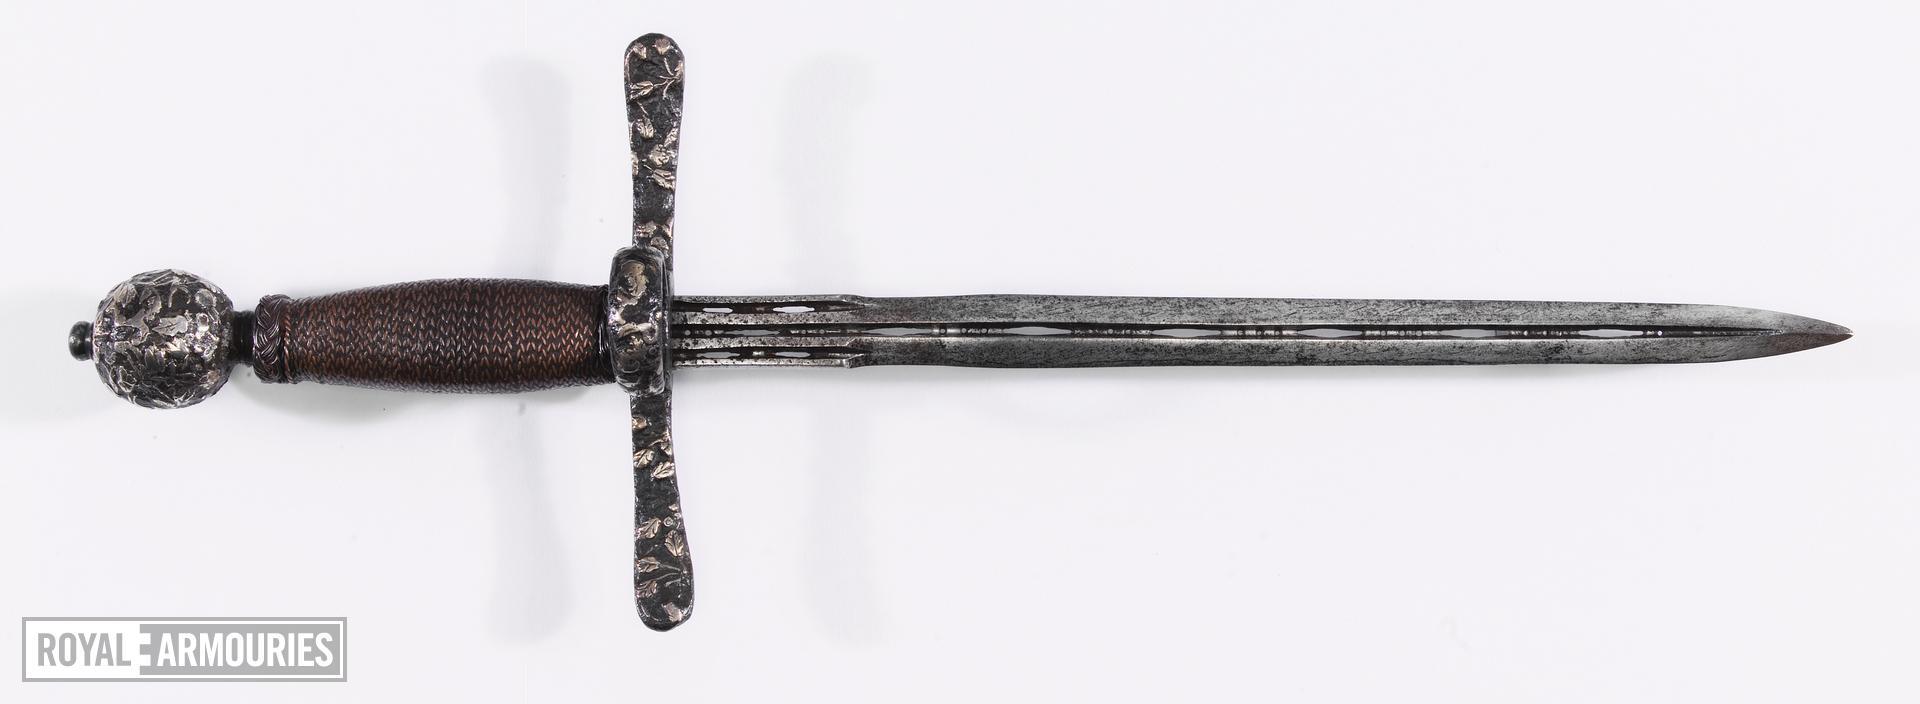 Dagger Left hand dagger from Littlecote collection